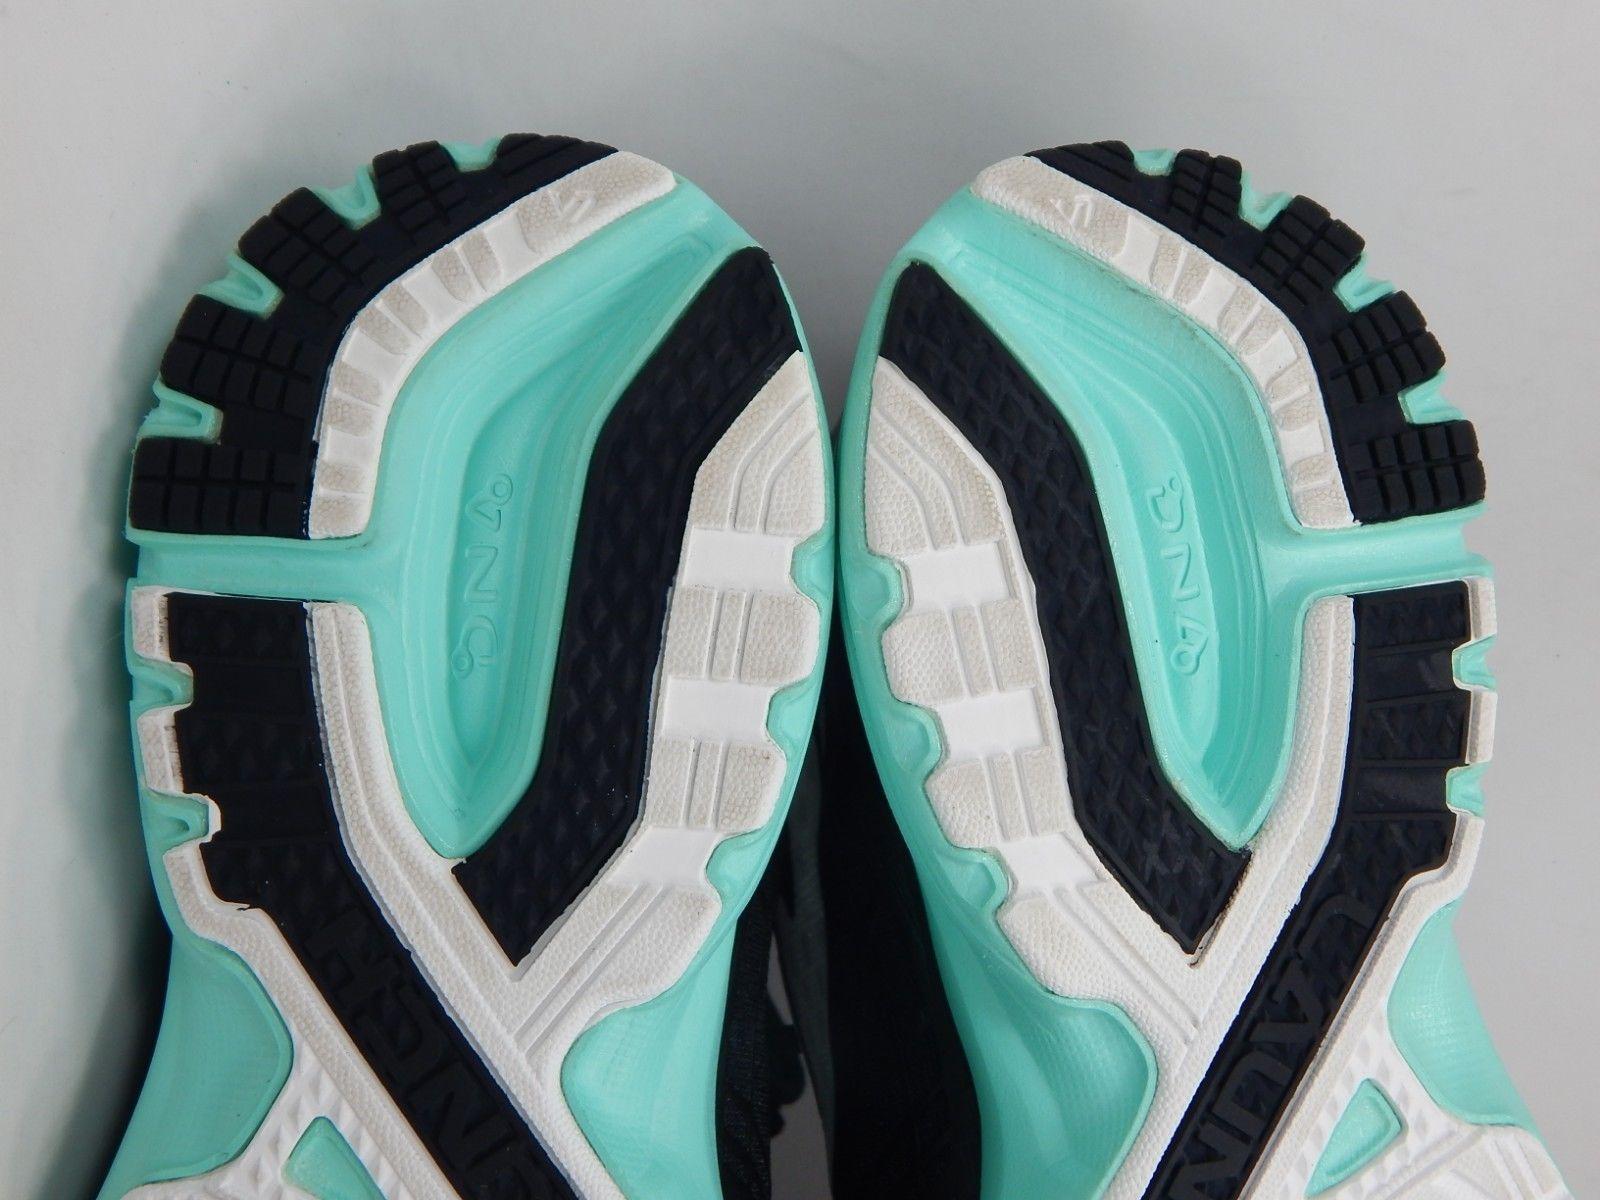 Brooks Launch 3 Size 6.5 M (B) EU 37.5 Women's Running Shoes Black 1202061B071 image 9